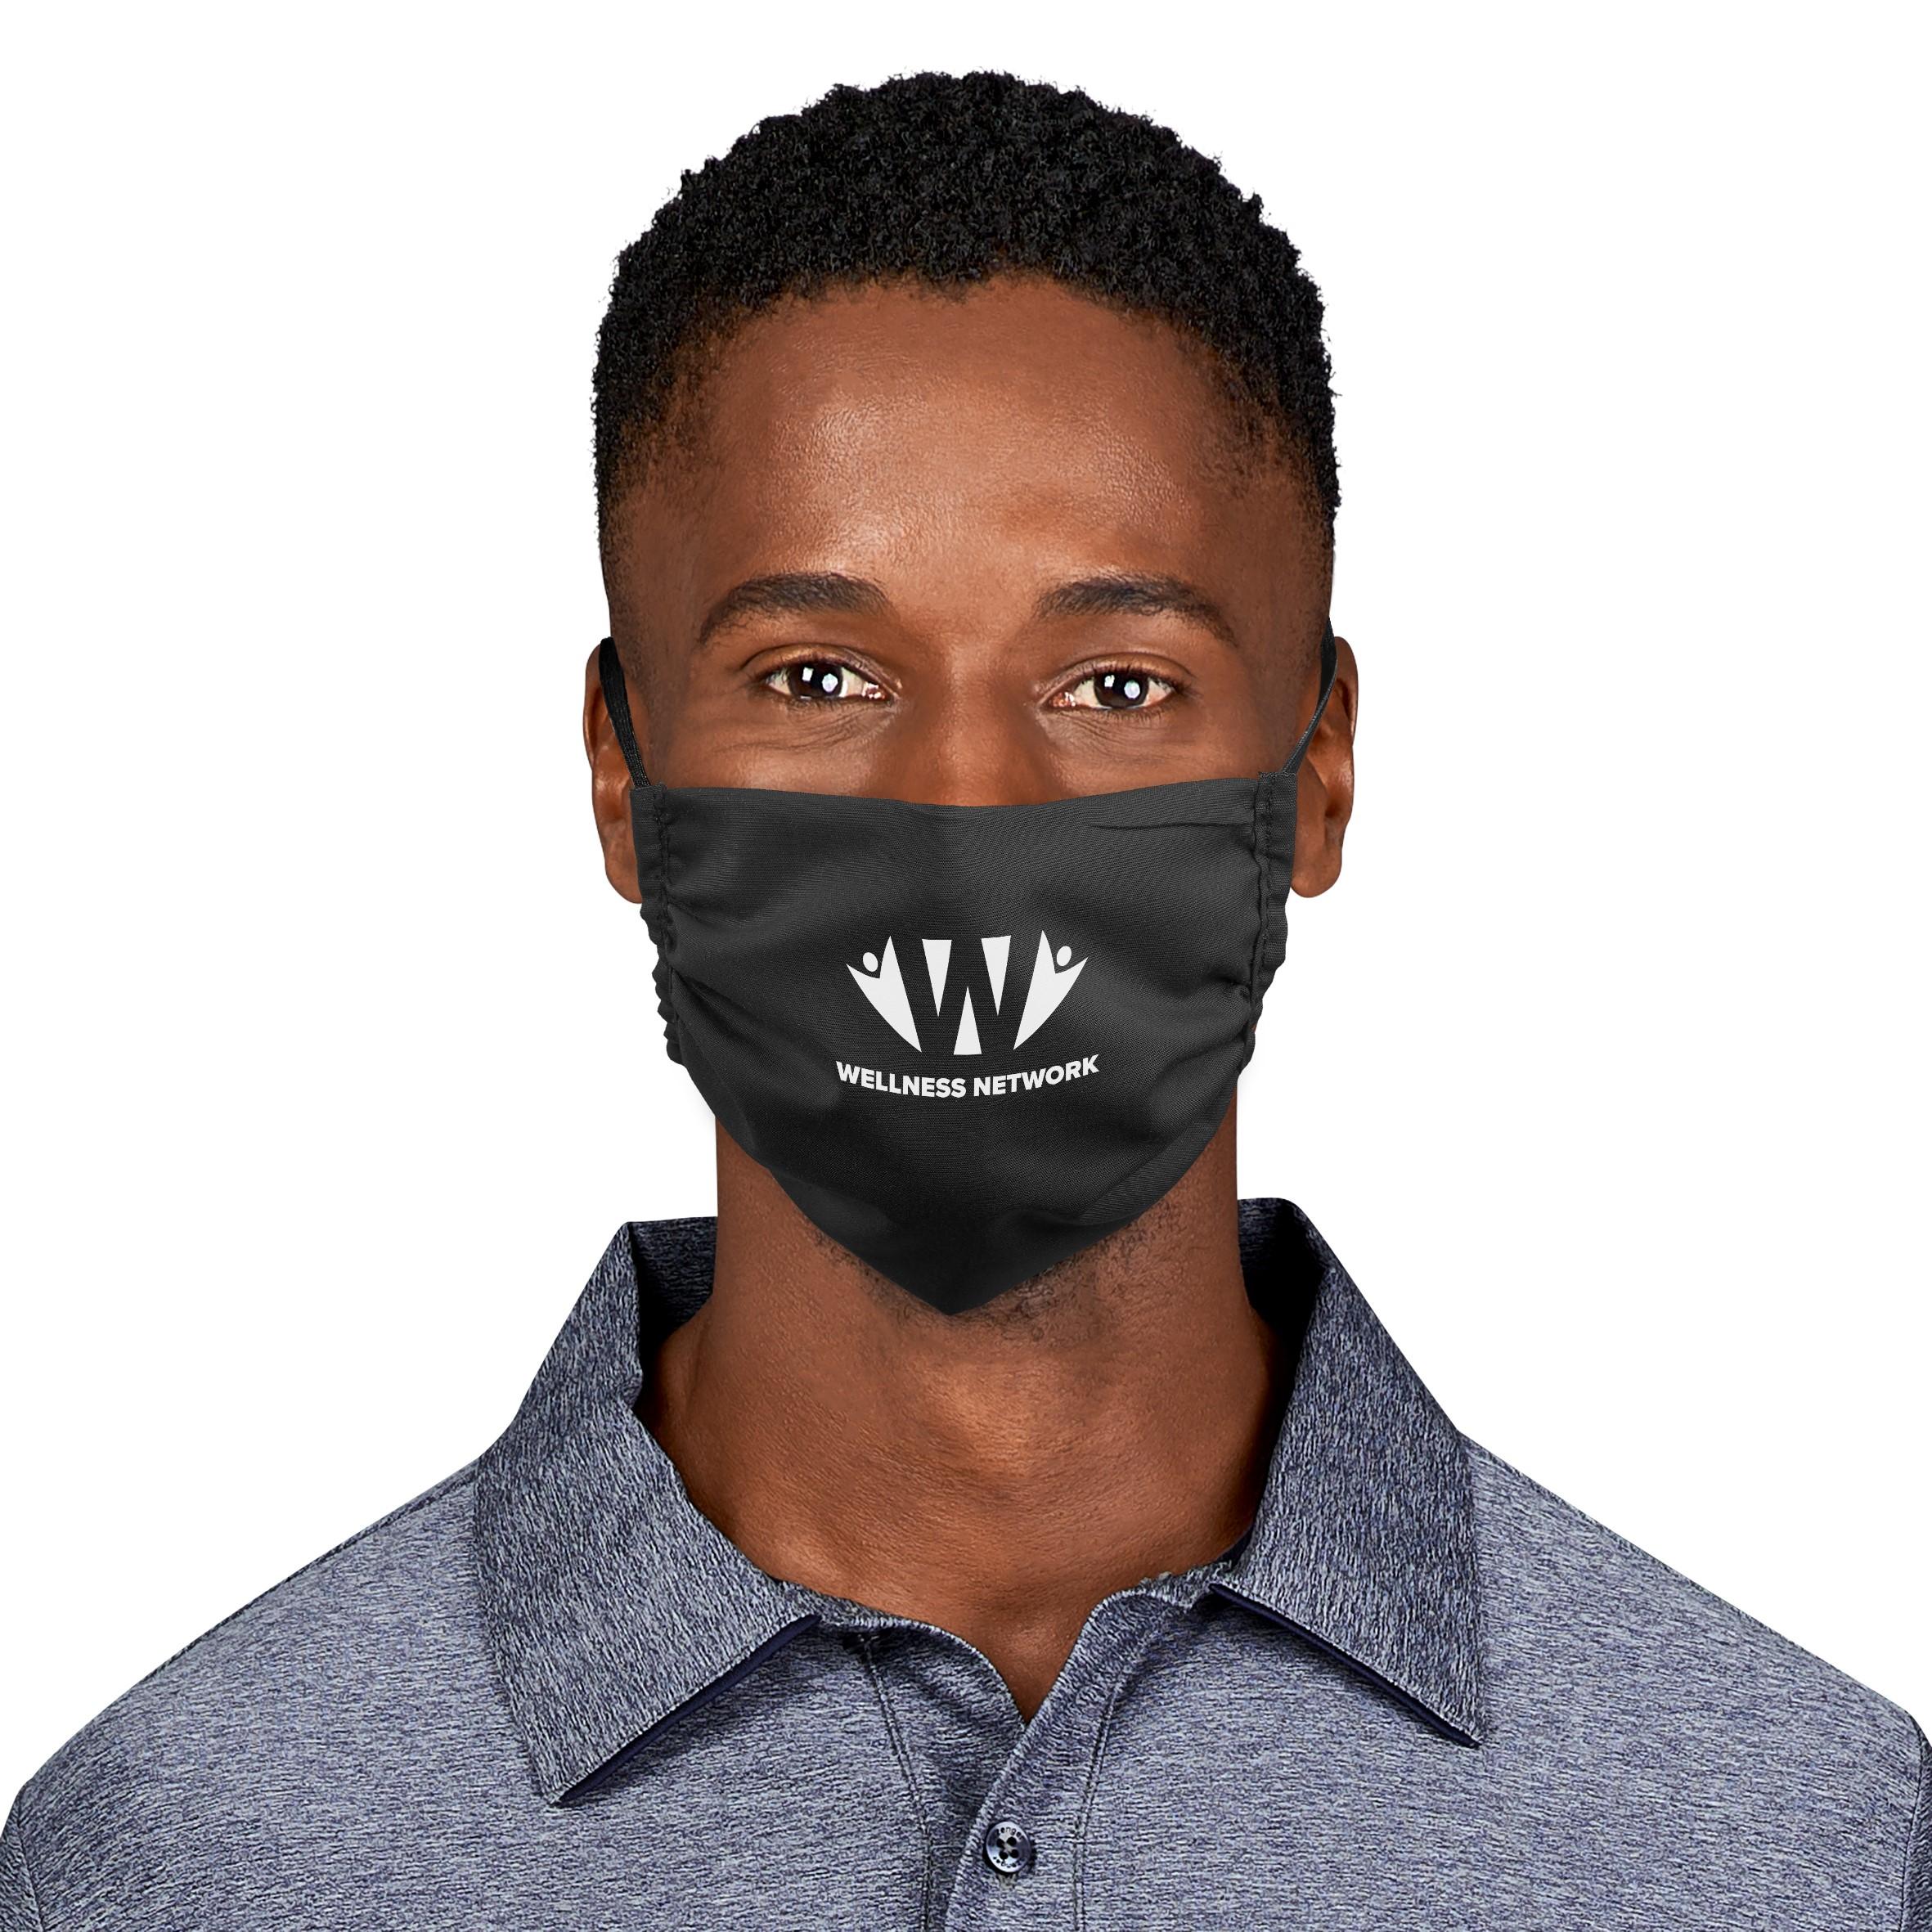 Product: Eva & Elm Double Layer Senior Face Mask - Black Only - Single